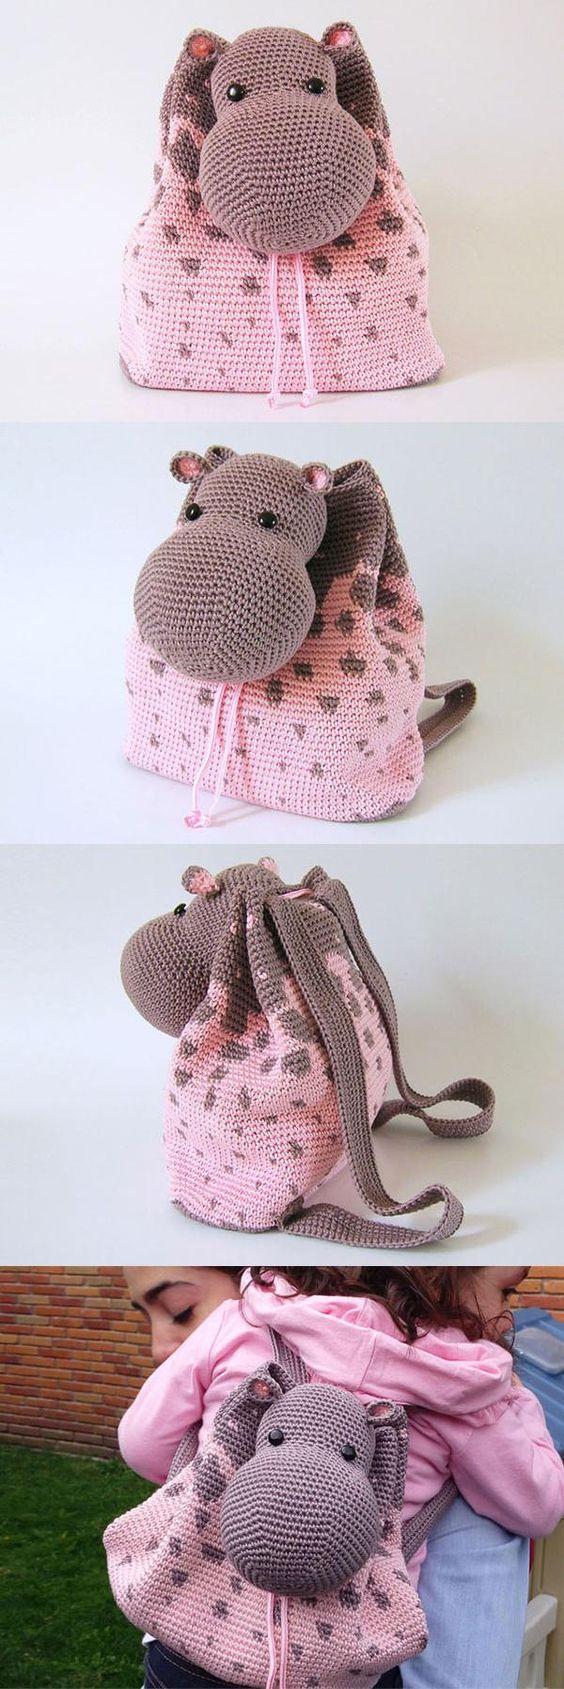 Hippo Backpack Crochet Pattern: